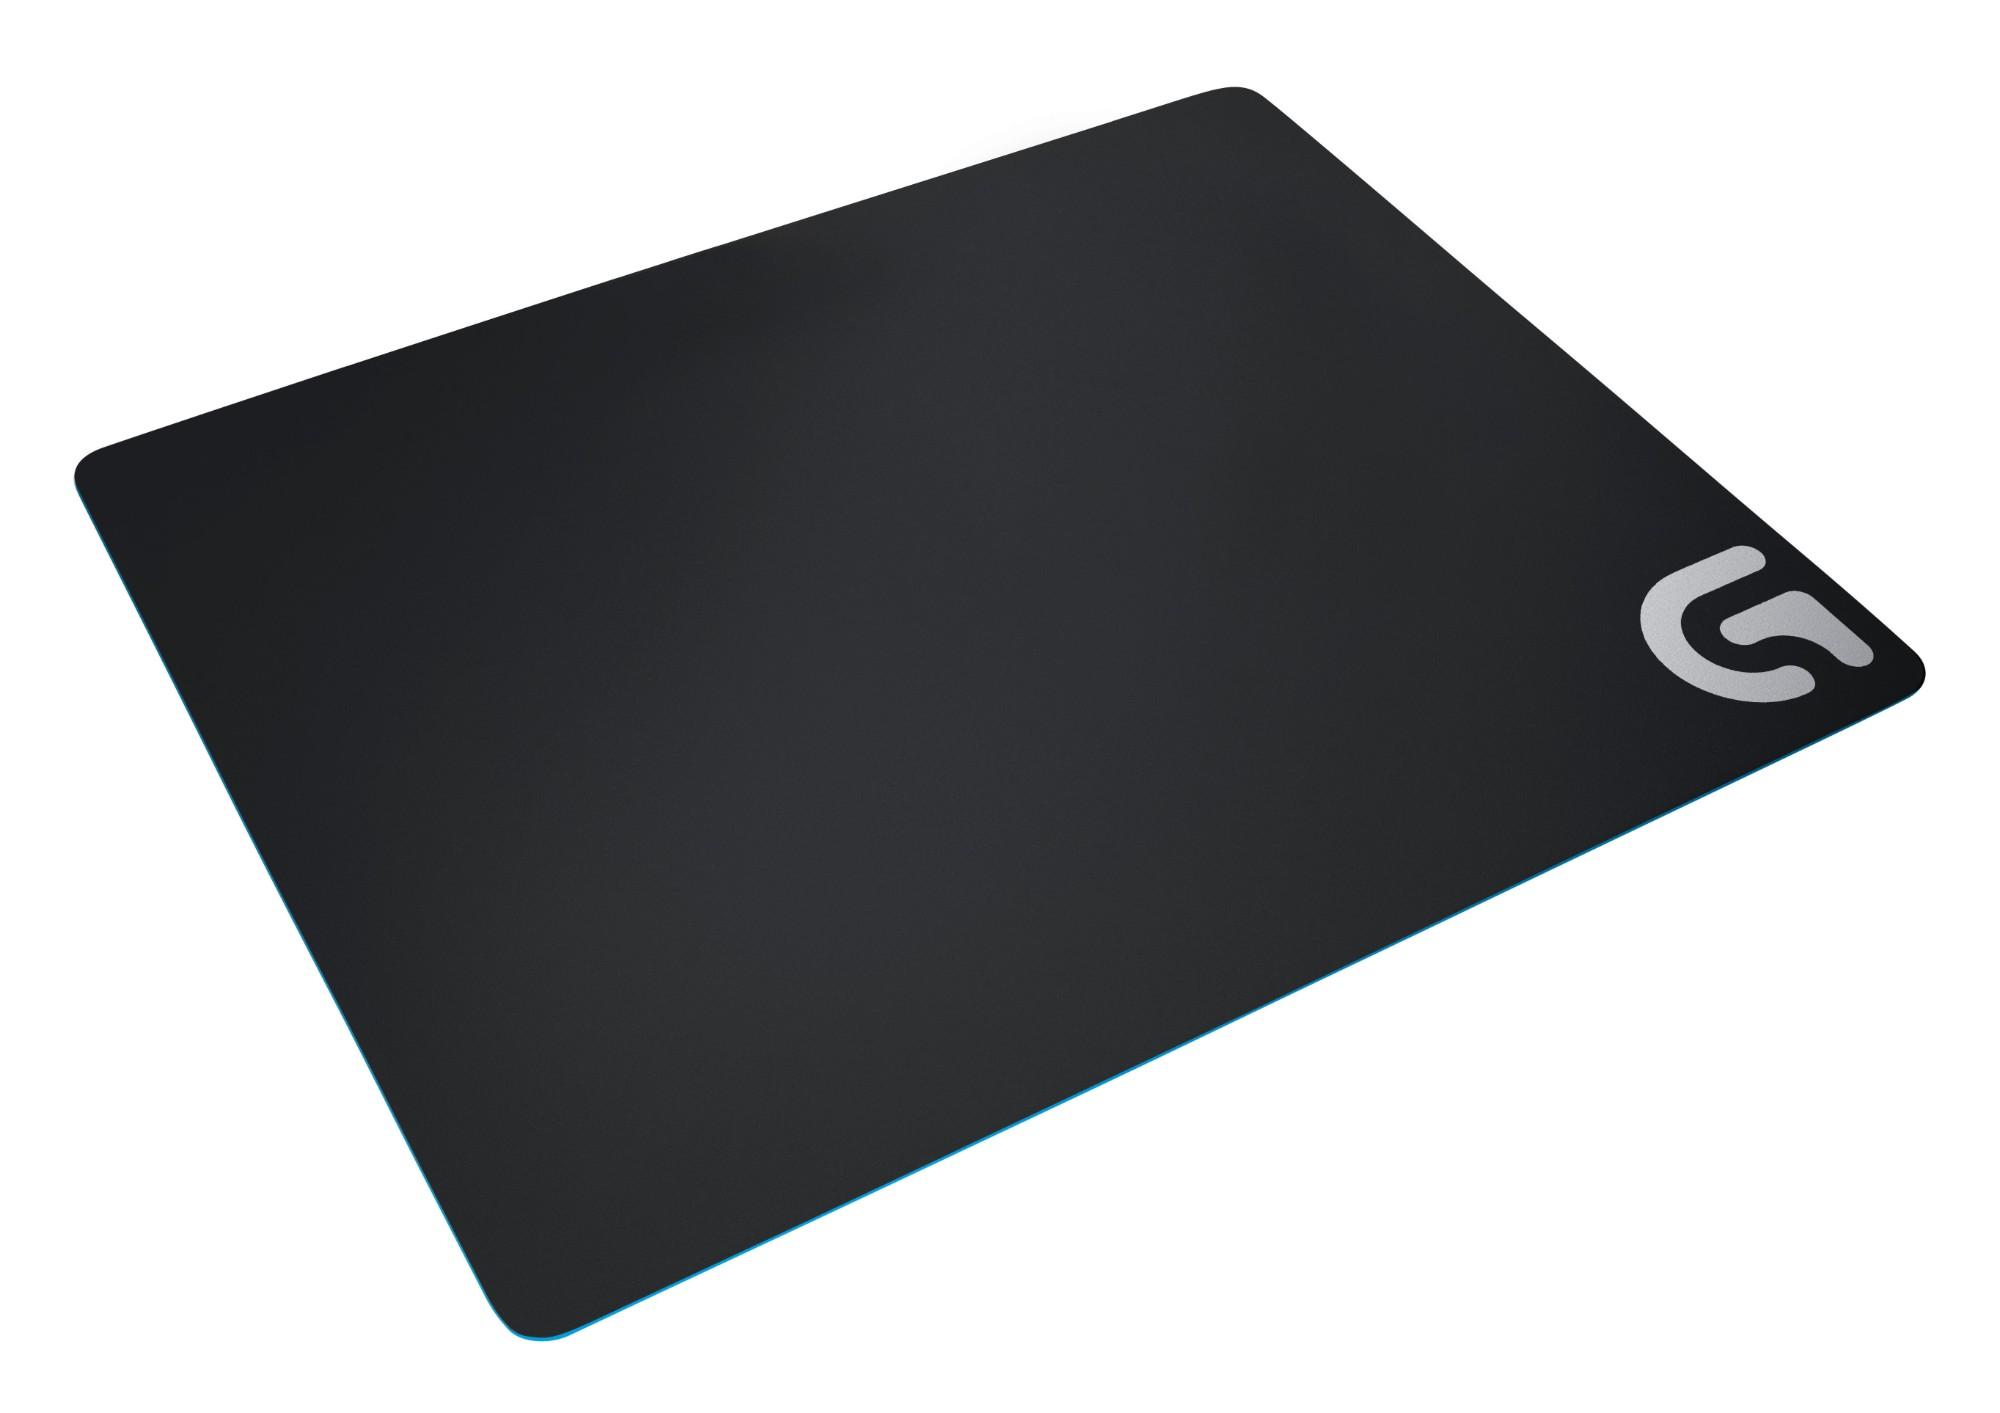 Logitech G G440 Negro Alfombrilla de ratón para juegos